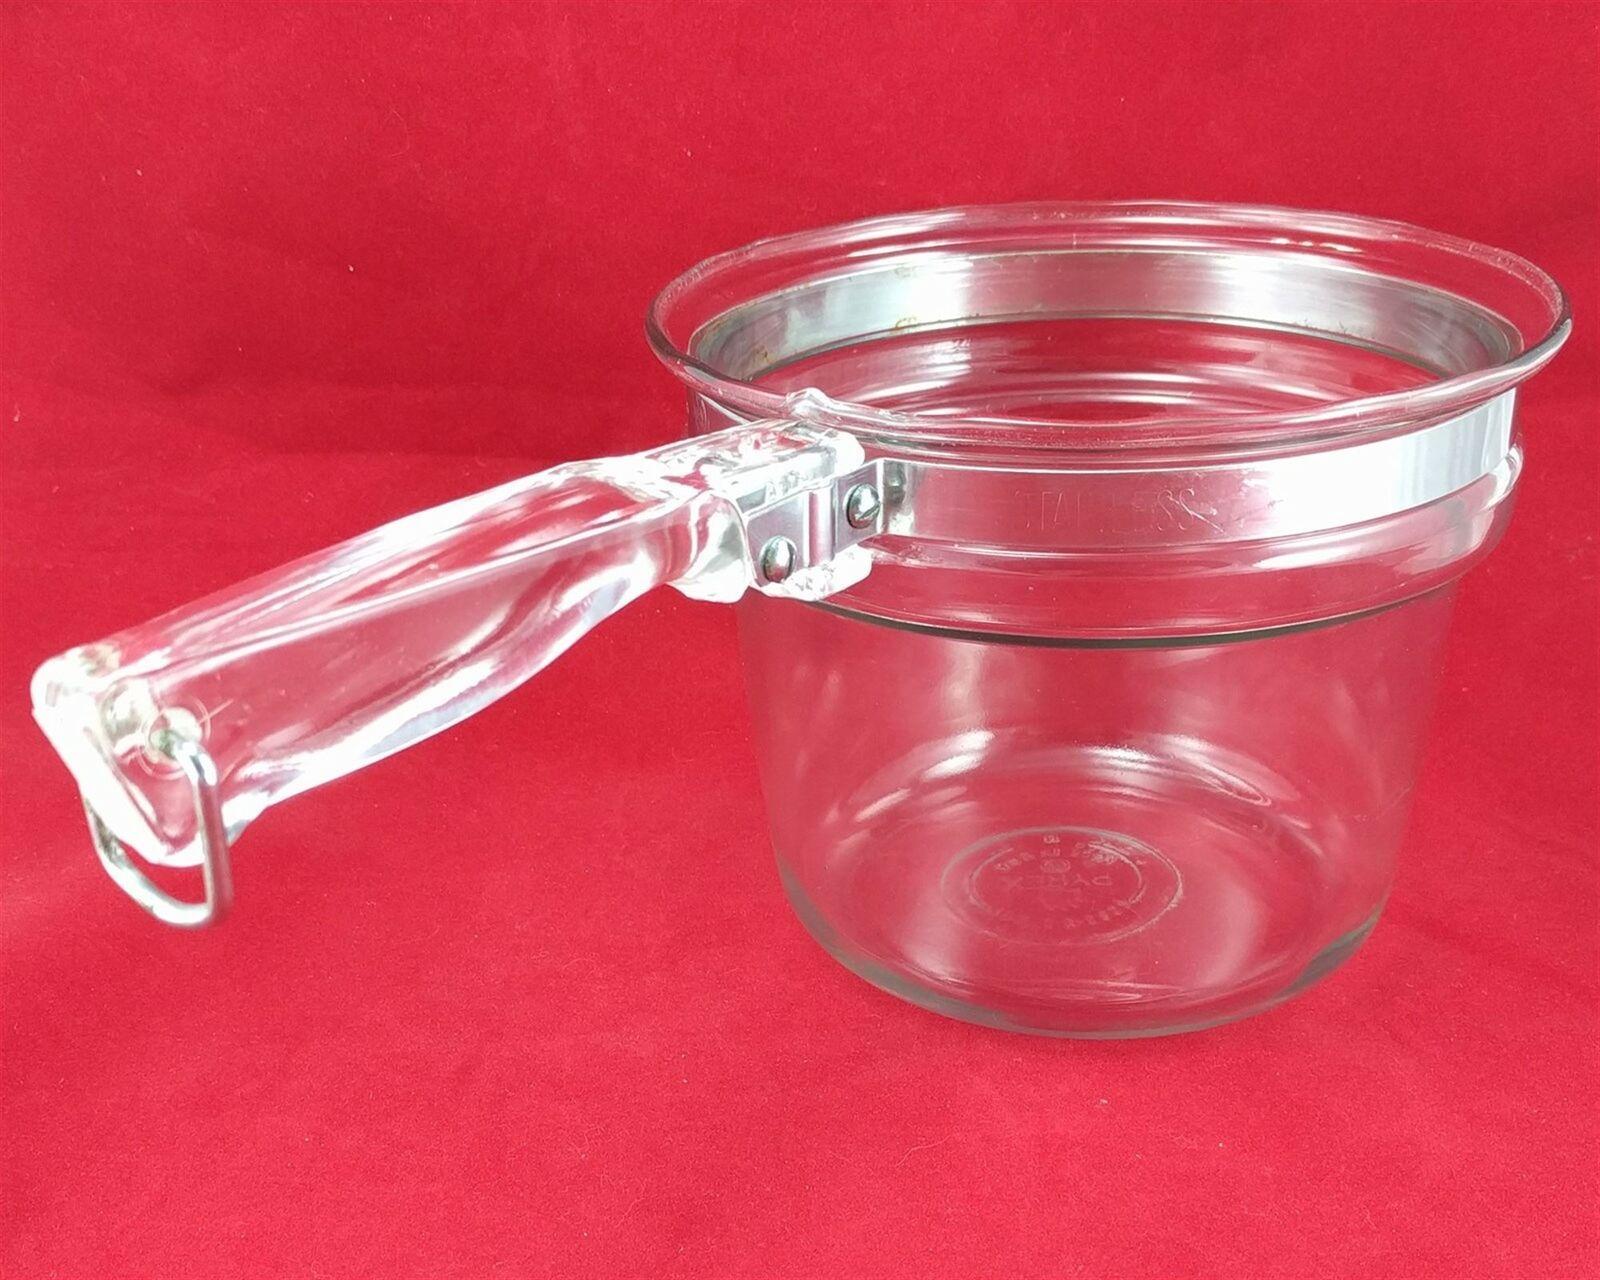 Pyrex Flameware 6283U 1½ qt Vintage Glass Saucepan w/ Stainless Steel Band